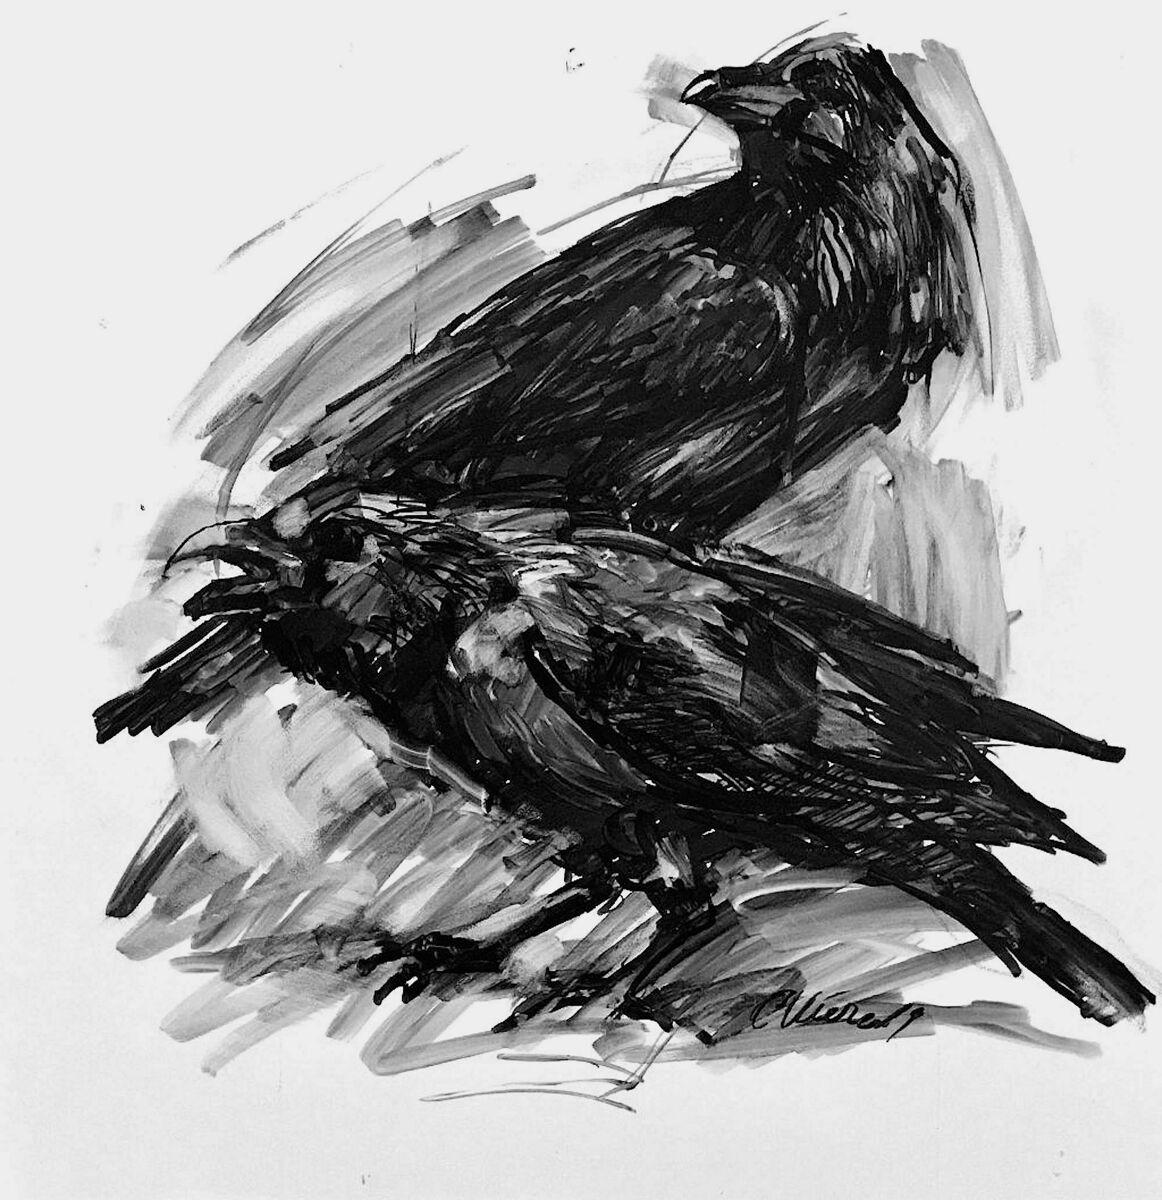 Black Birds (large view)